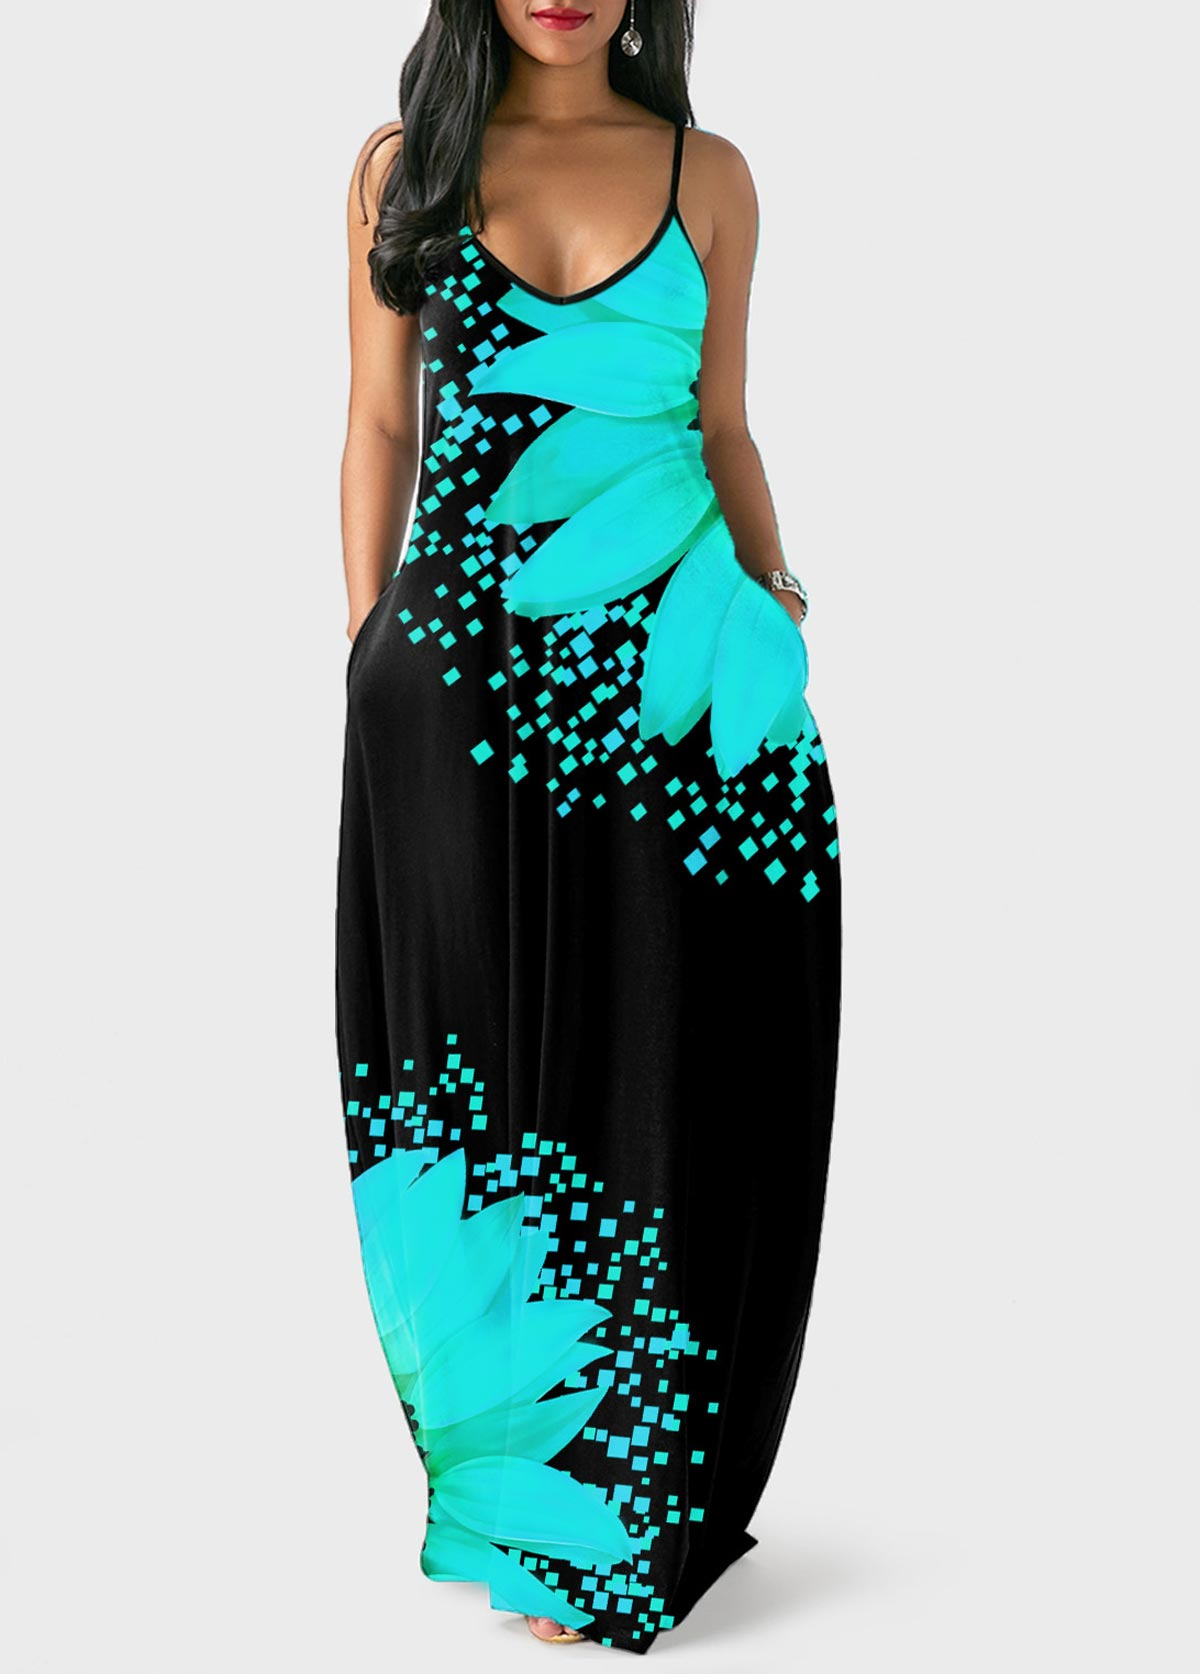 Side Pocket Sunflower Print Spaghetti Strap Dress